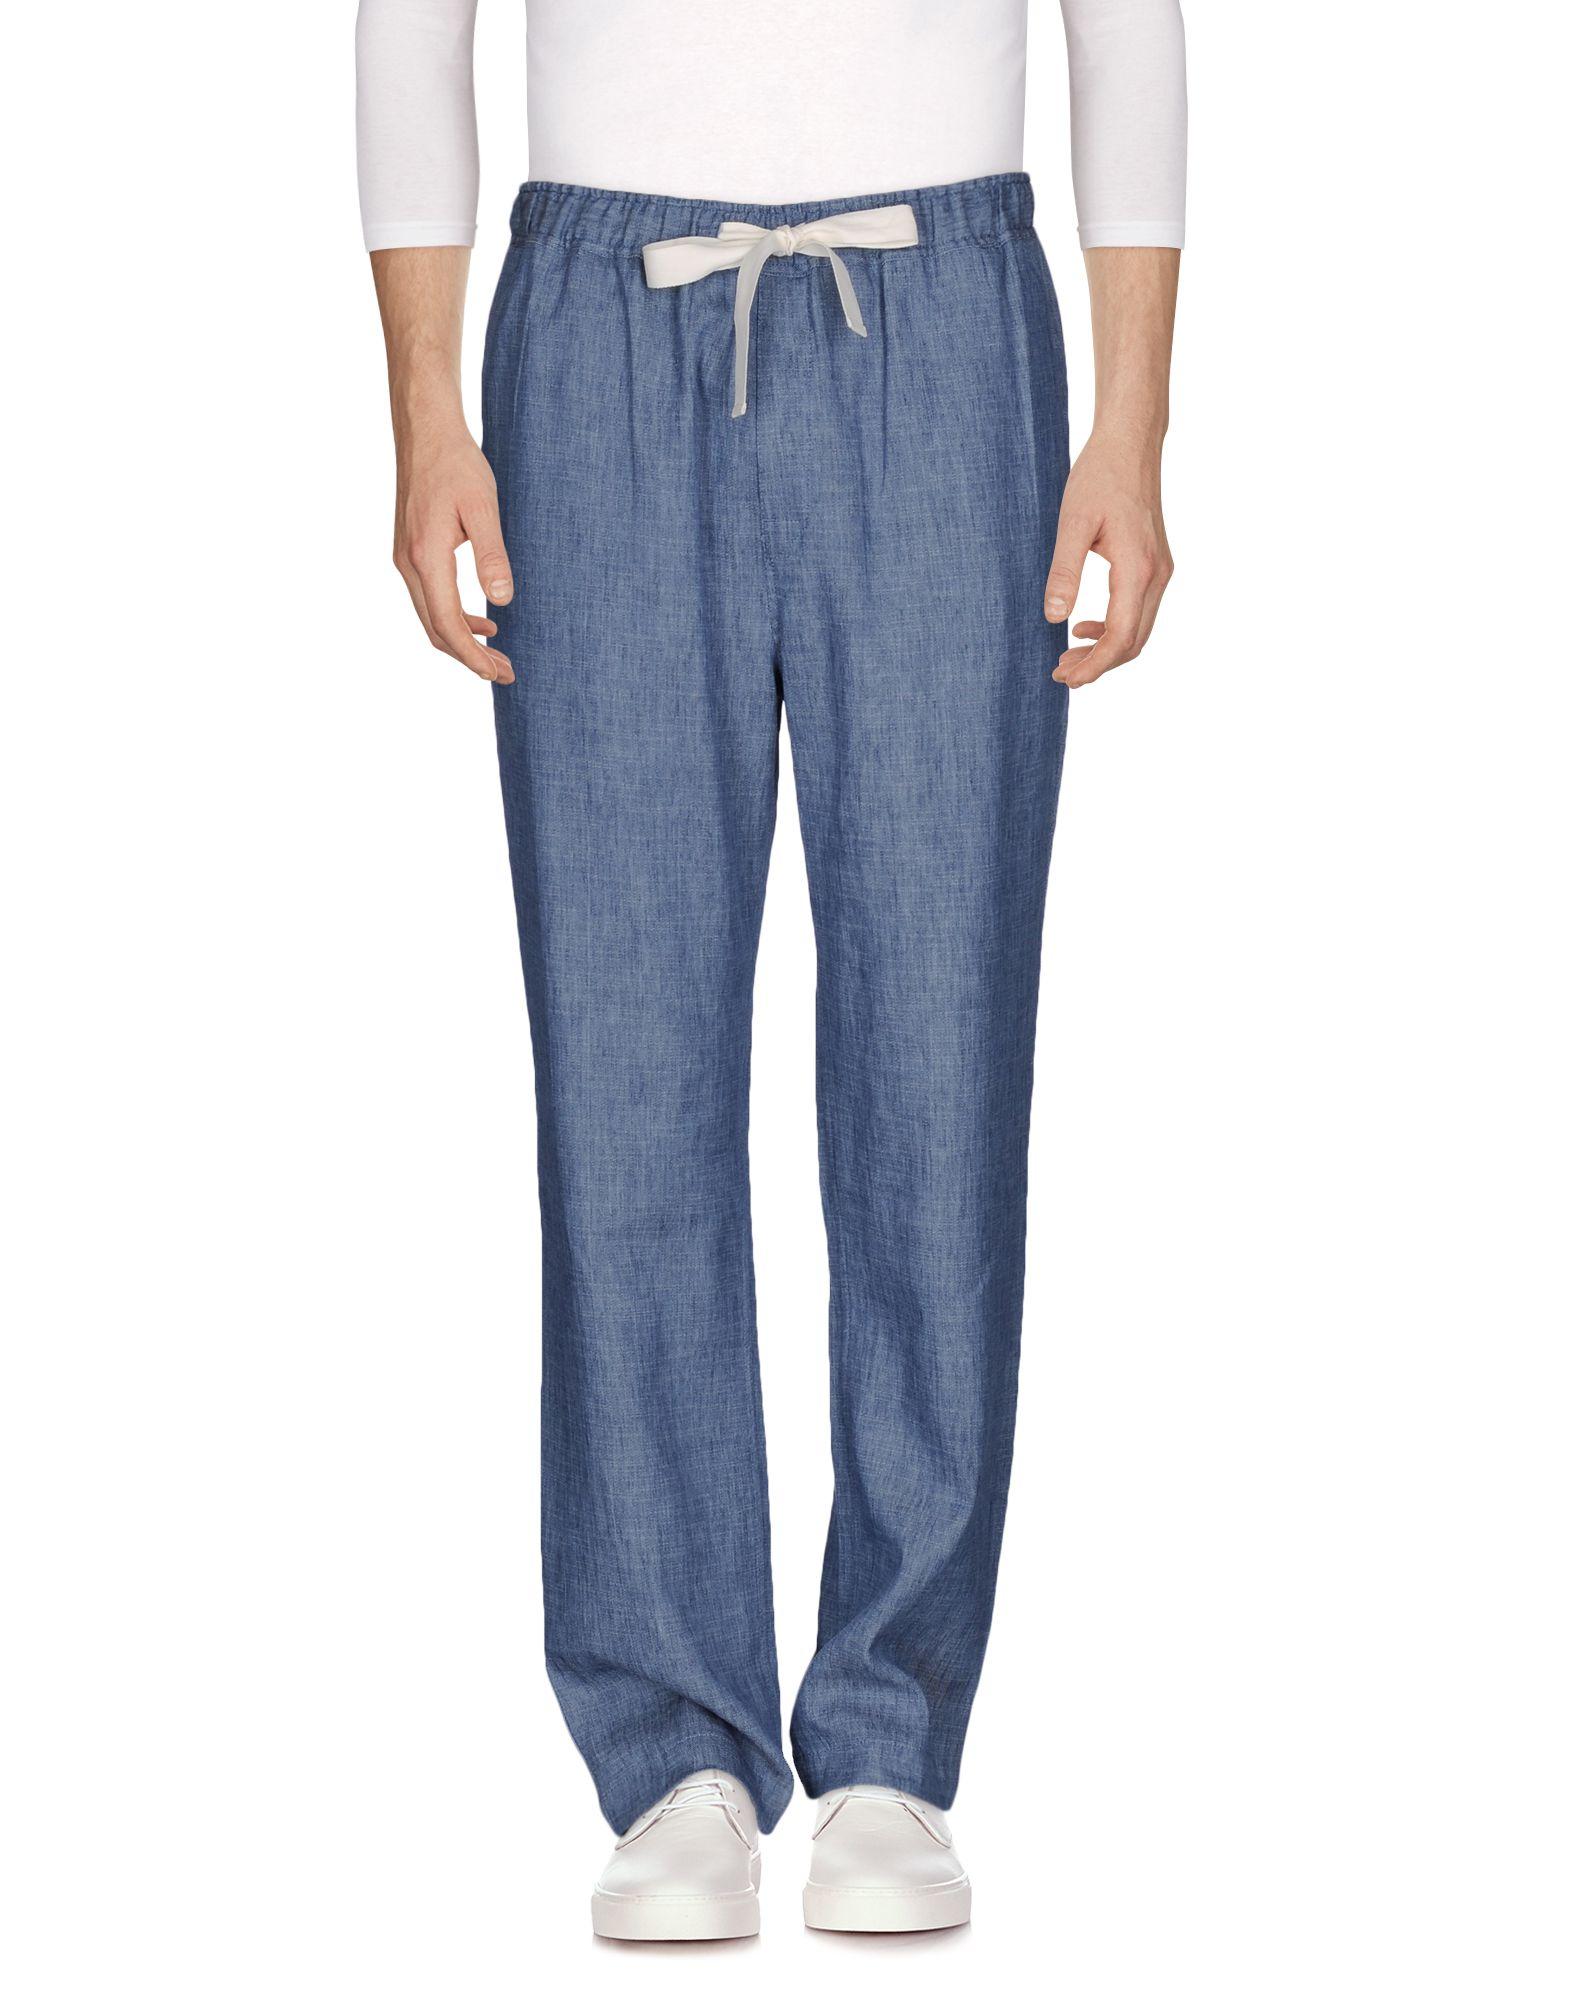 Pantaloni Jeans Msgm Donna - Acquista online su